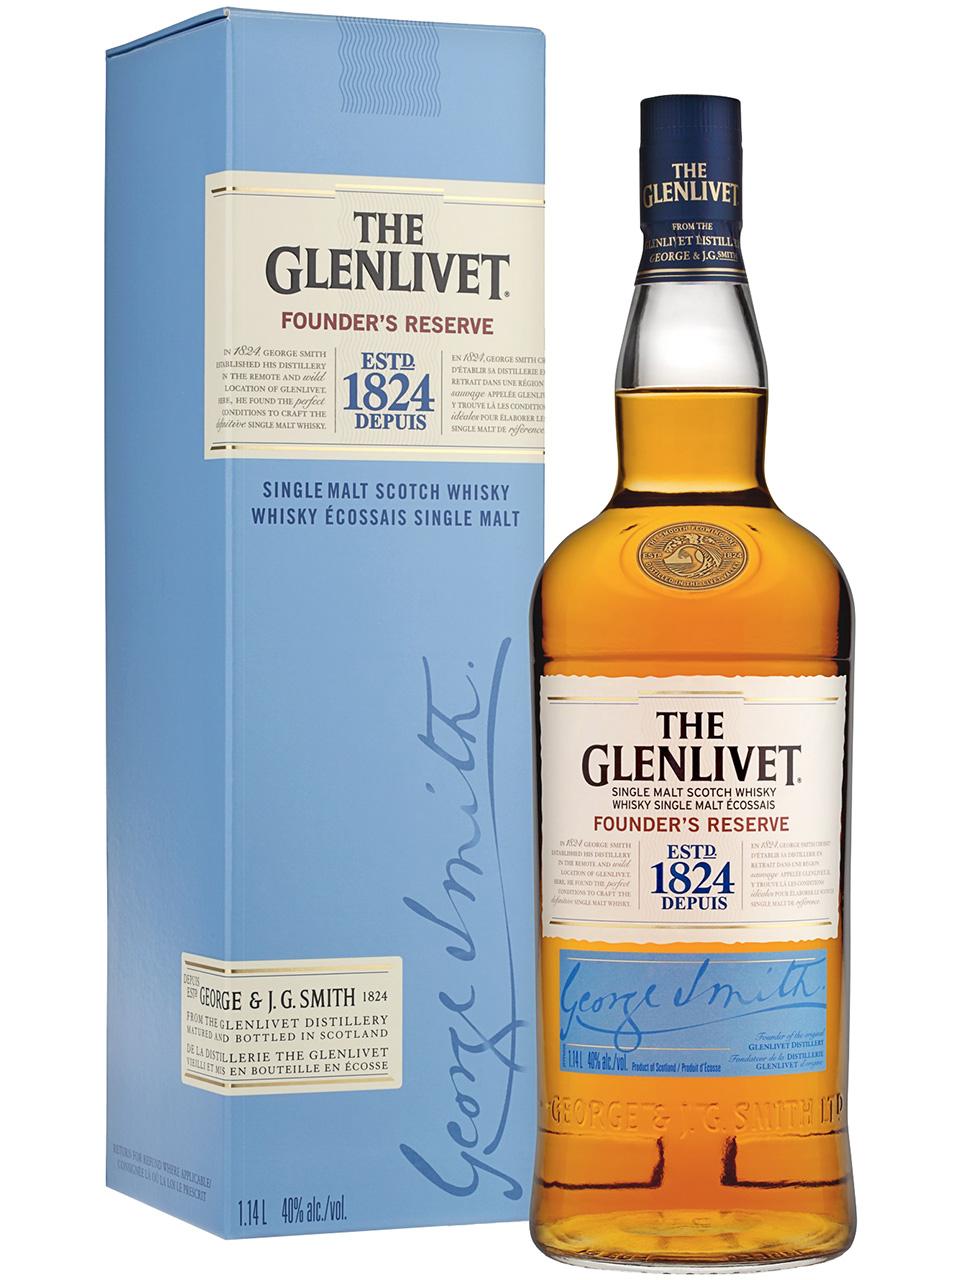 The Glenlivet Founder's Reserve Single Malt Scotch